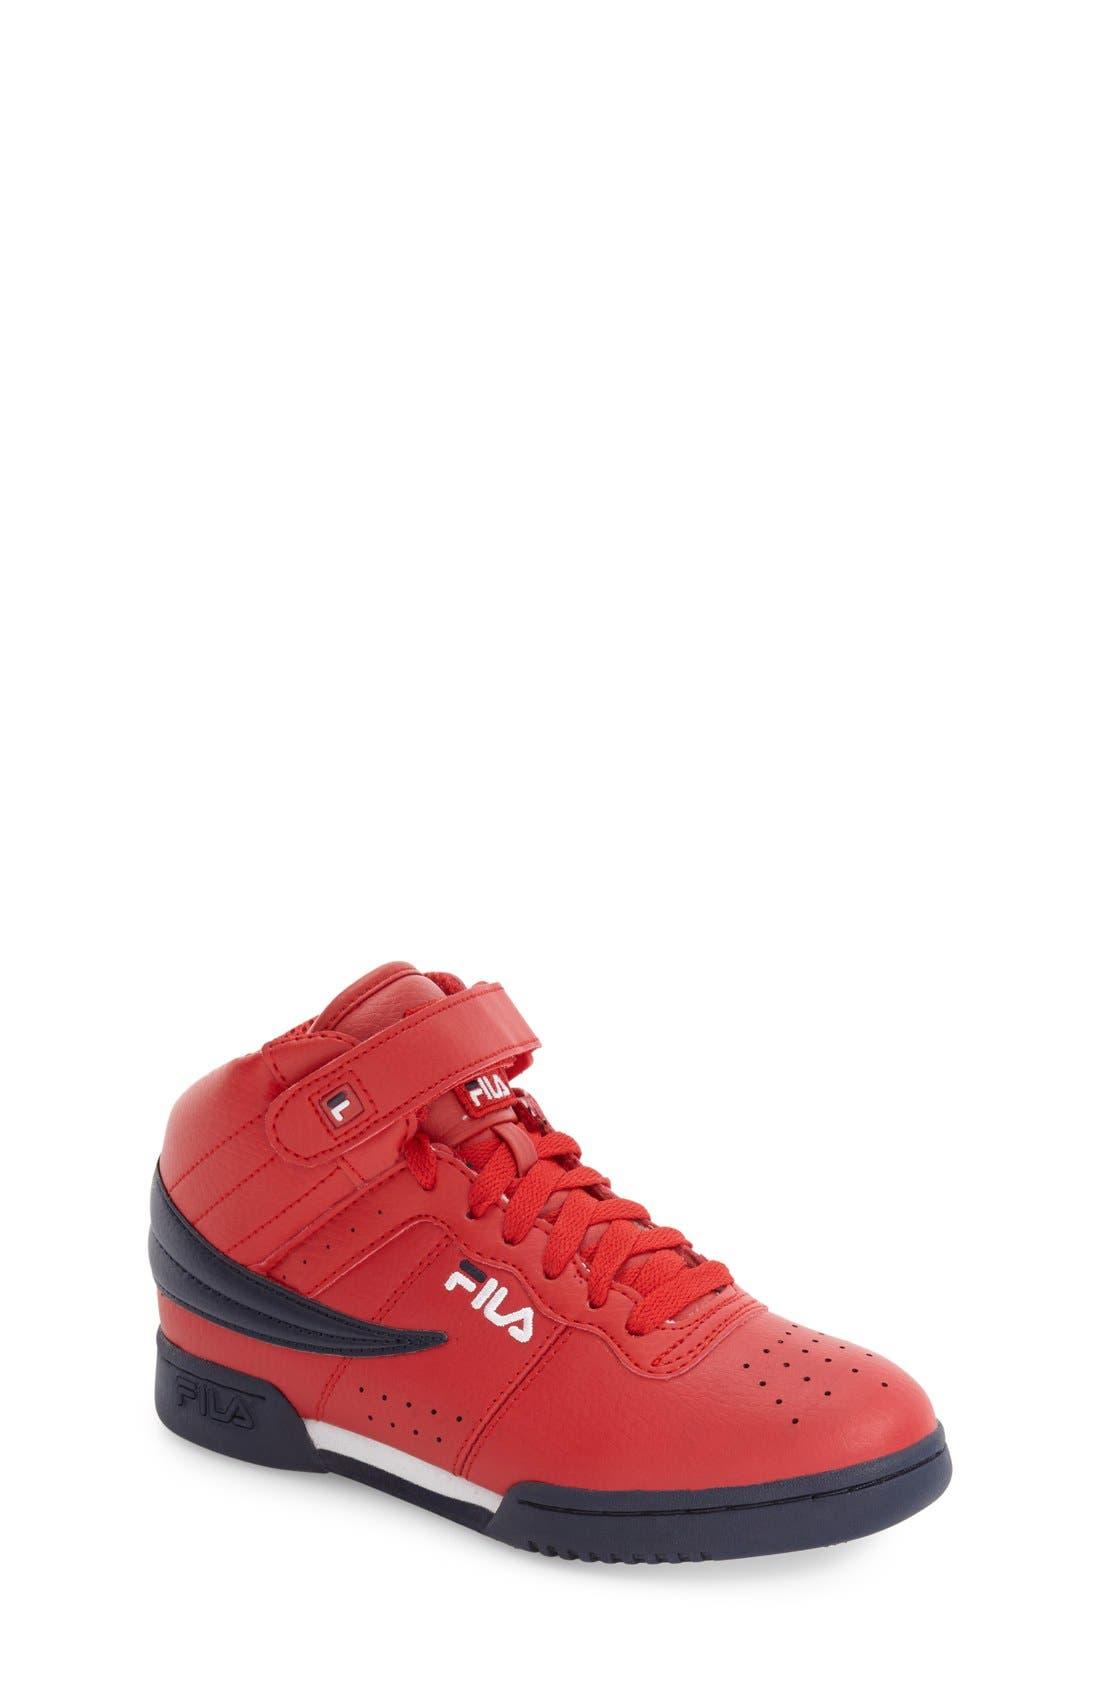 FILA F-13 High Top Sneaker (Big Kid)